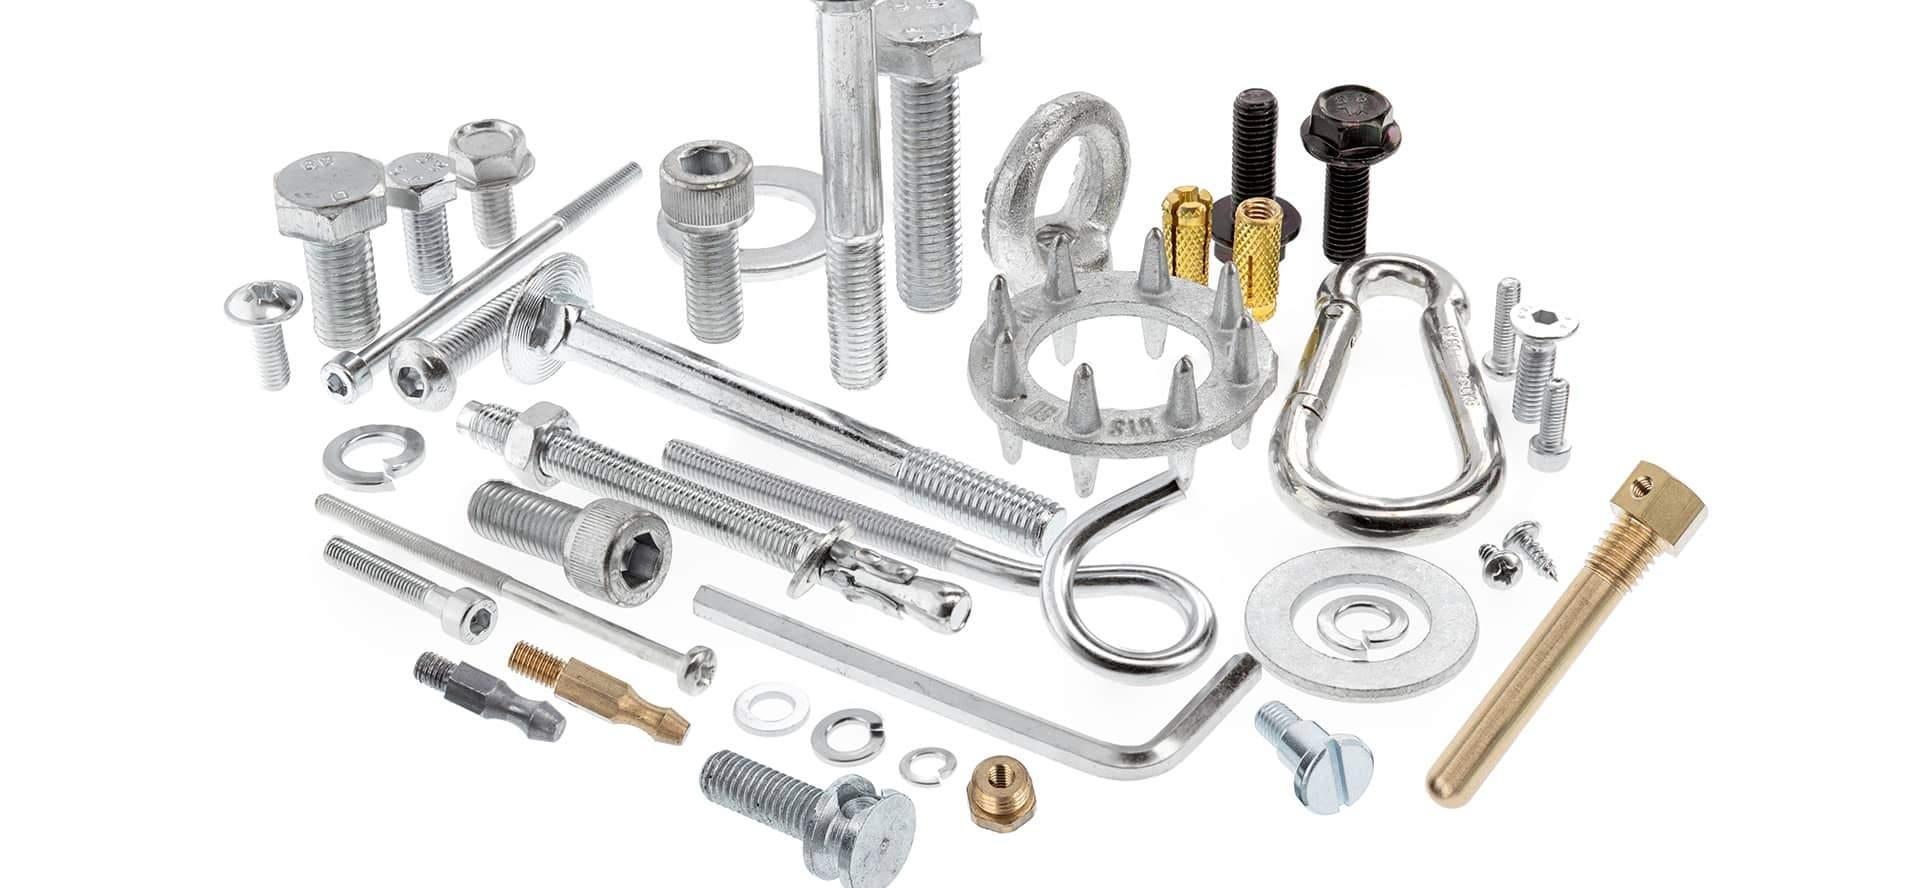 Wyroby wg DIN / ISO / PN steam